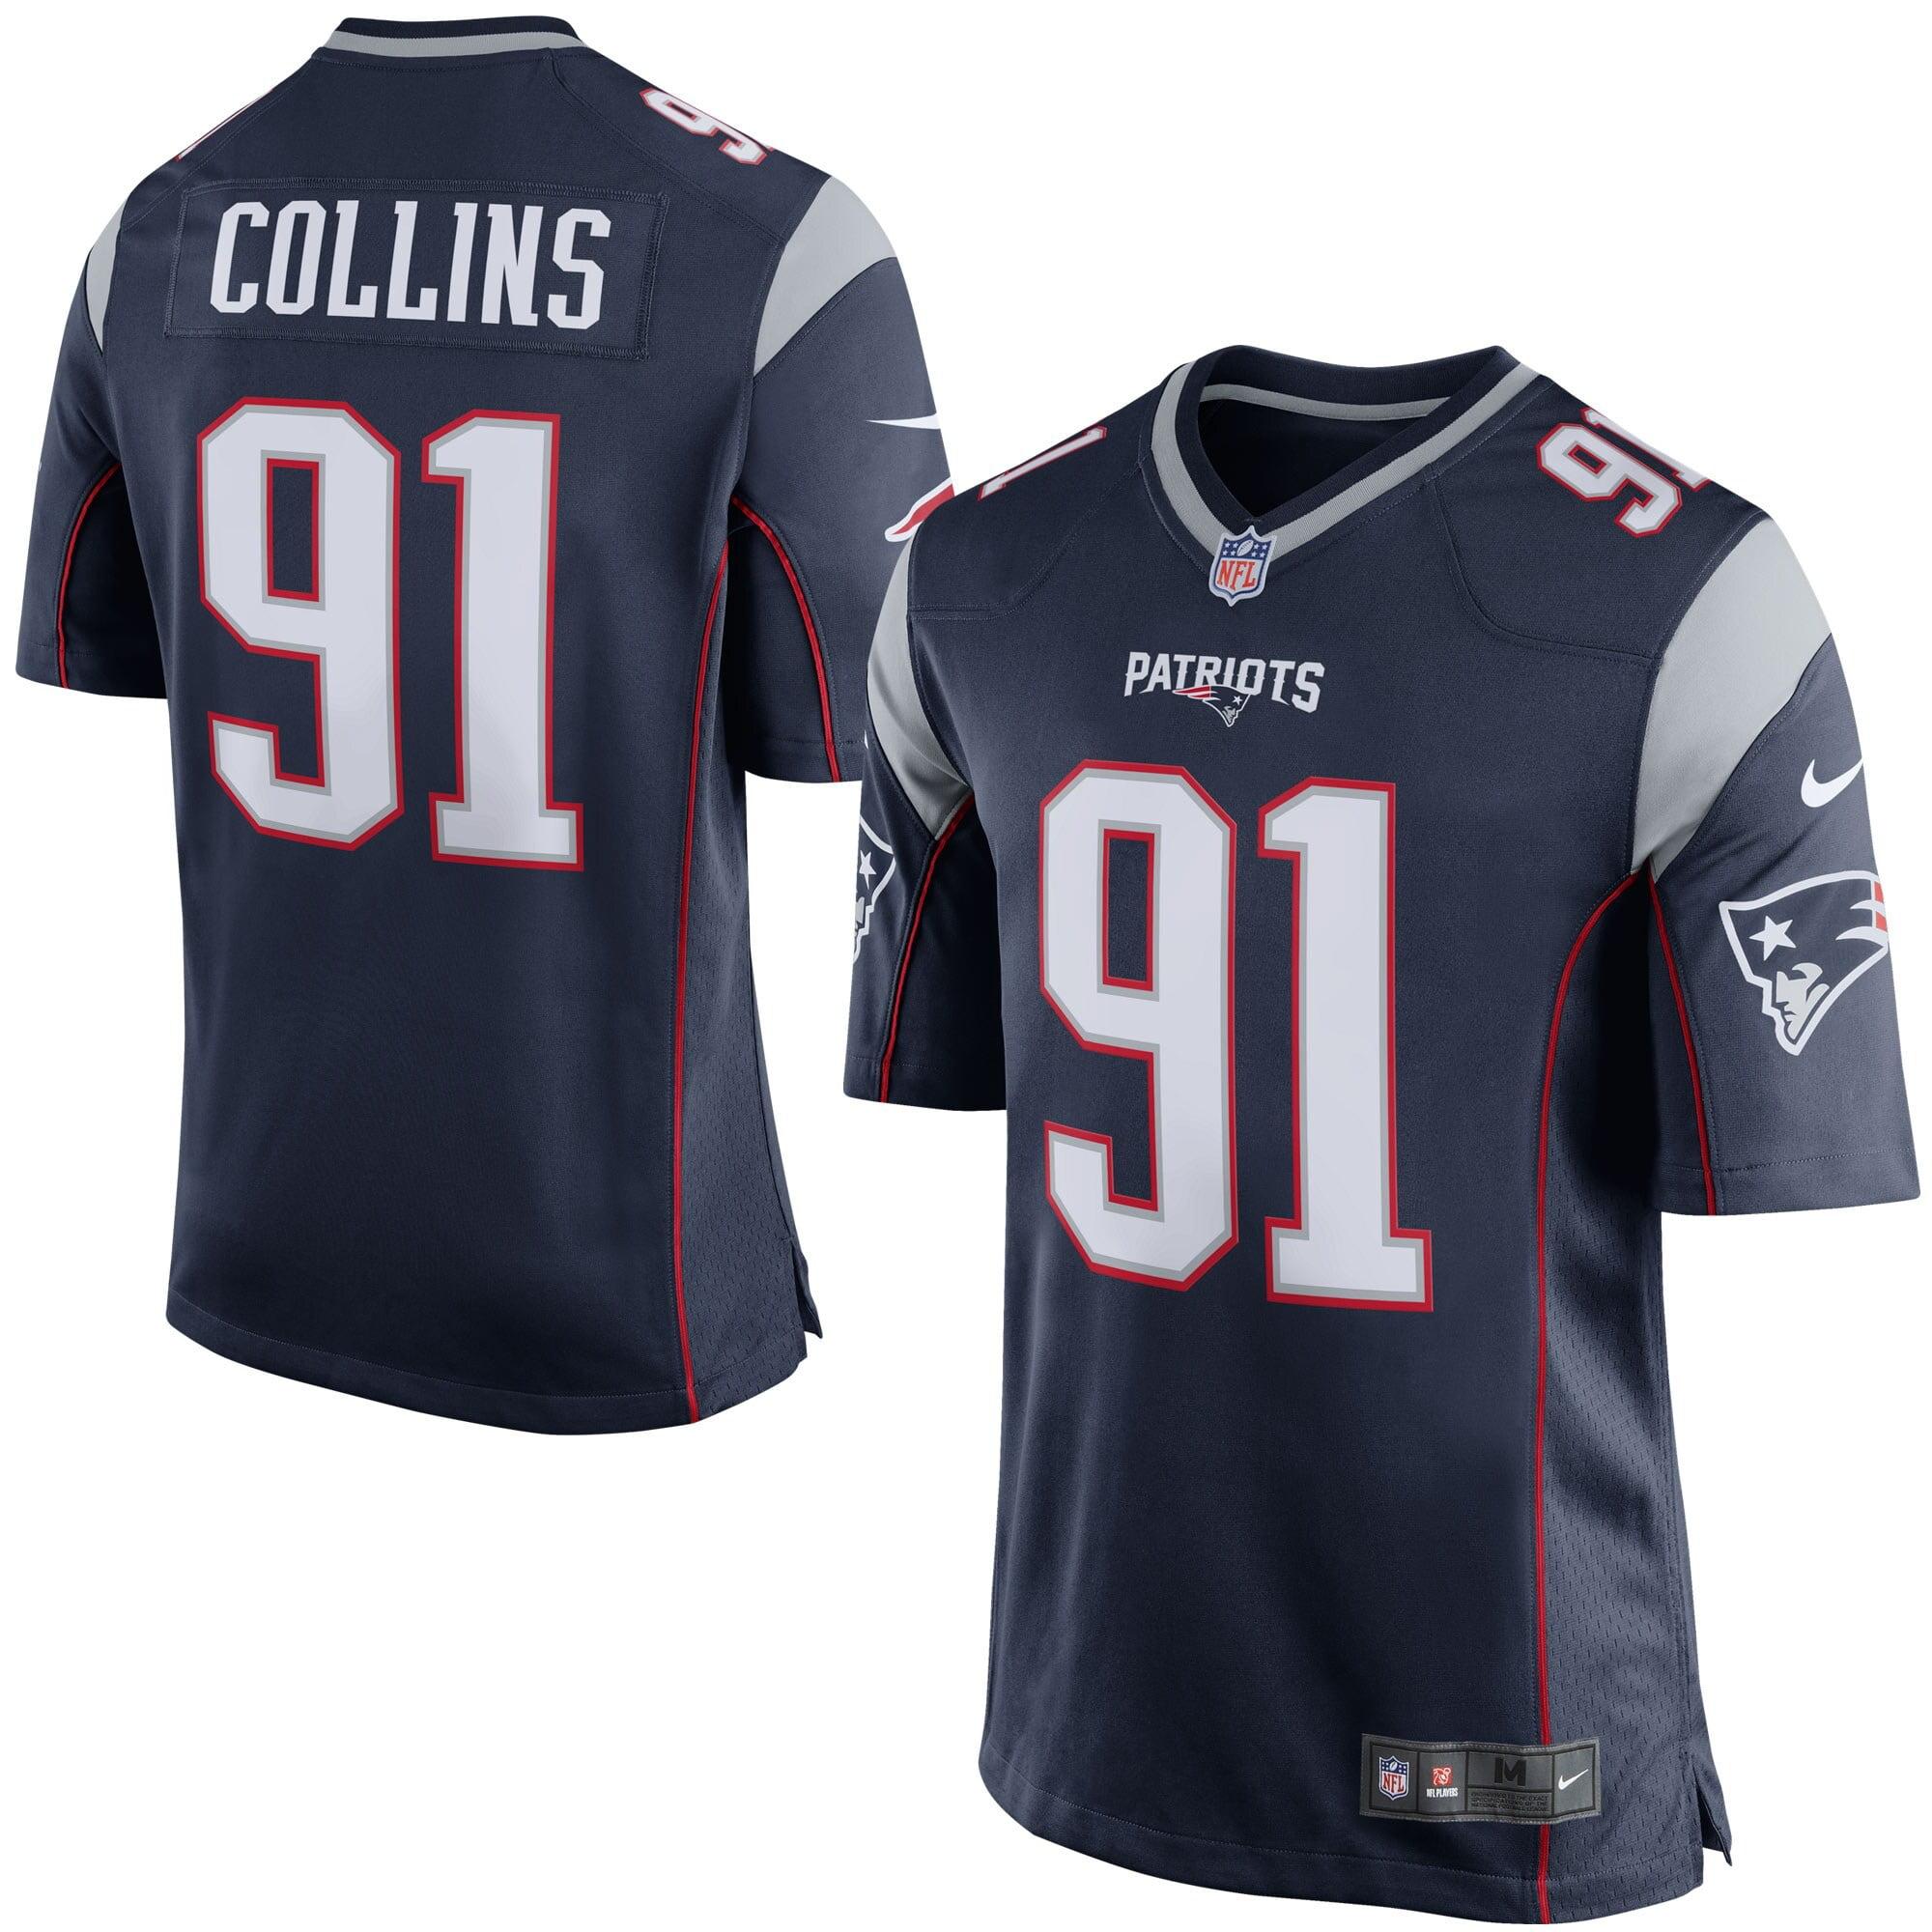 Jamie Collins New England Patriots Nike Game Jersey - Navy Blue - Walmart.com